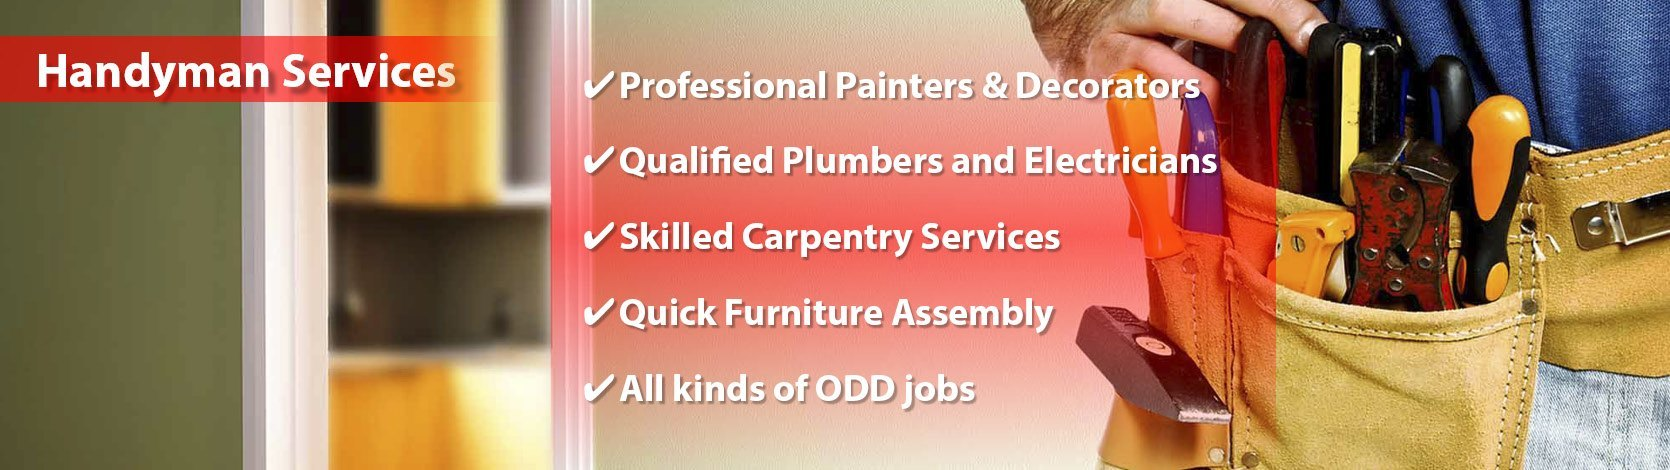 handyman services slide